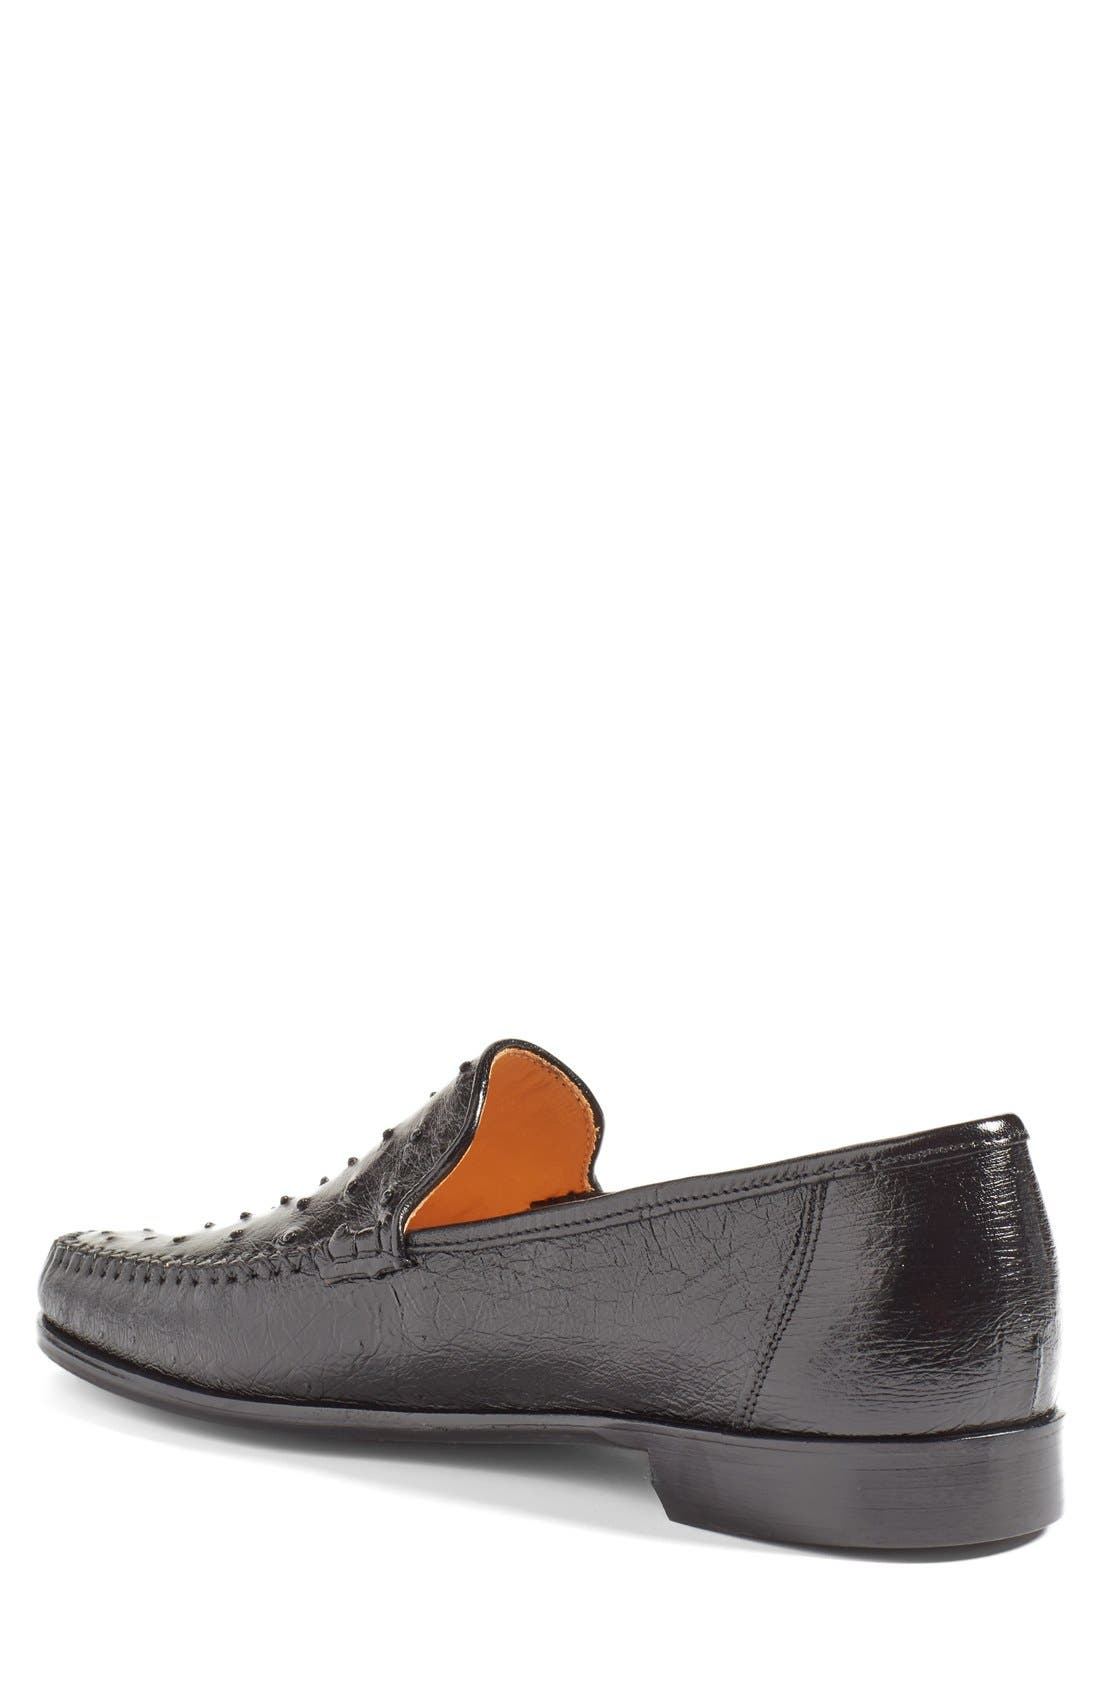 'Struzzo' Ostrich Slip-On Loafer,                             Alternate thumbnail 3, color,